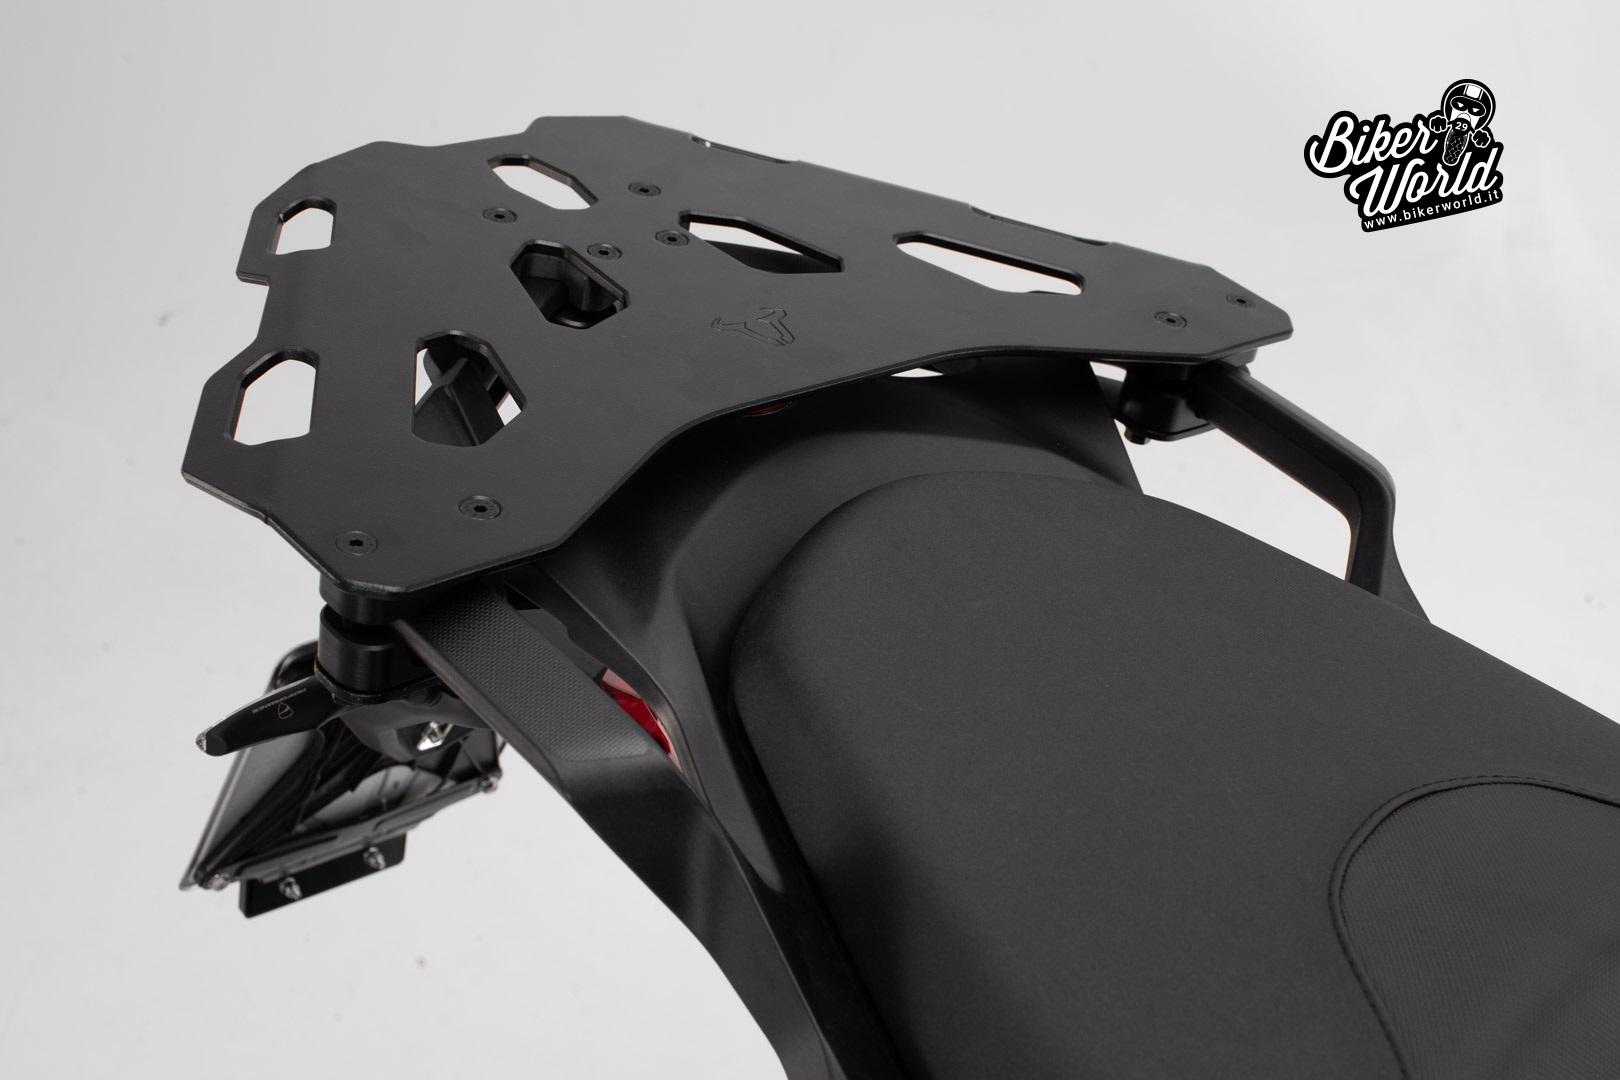 Sw Motech Kit Street Rack Ducati Multistrada 950 1200 Enduro 16